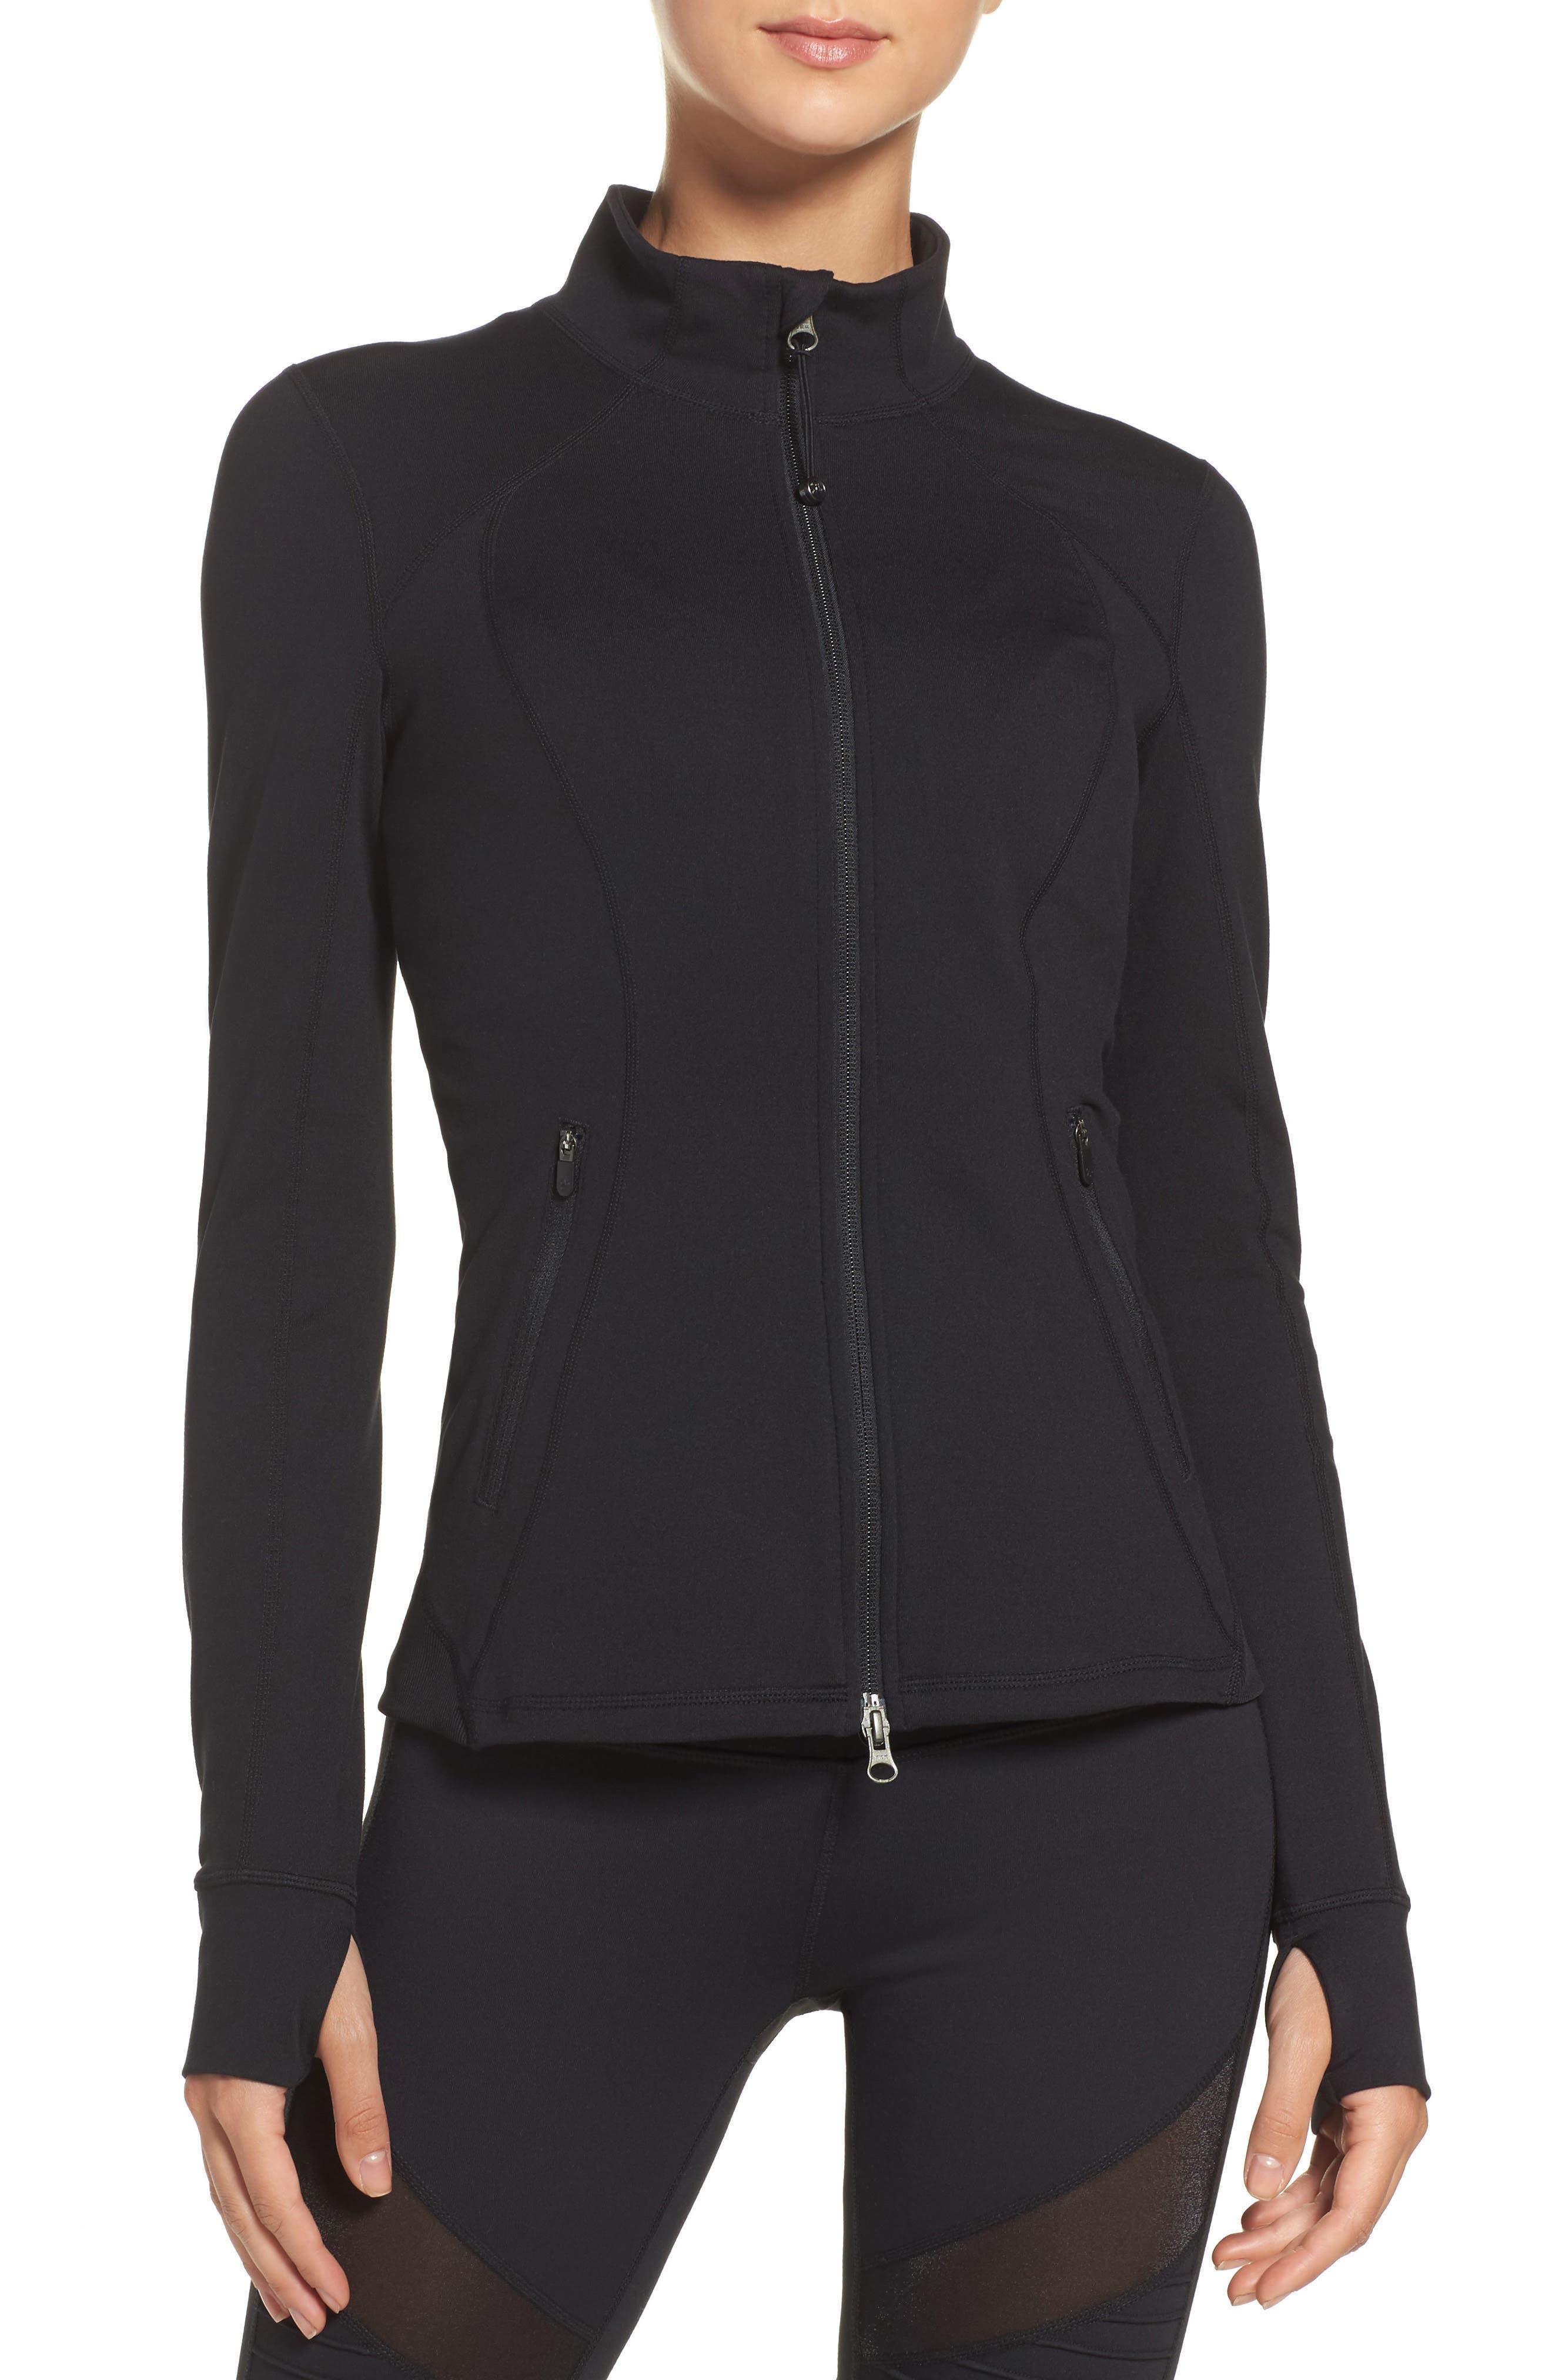 Presence Training Jacket,                         Main,                         color, Black